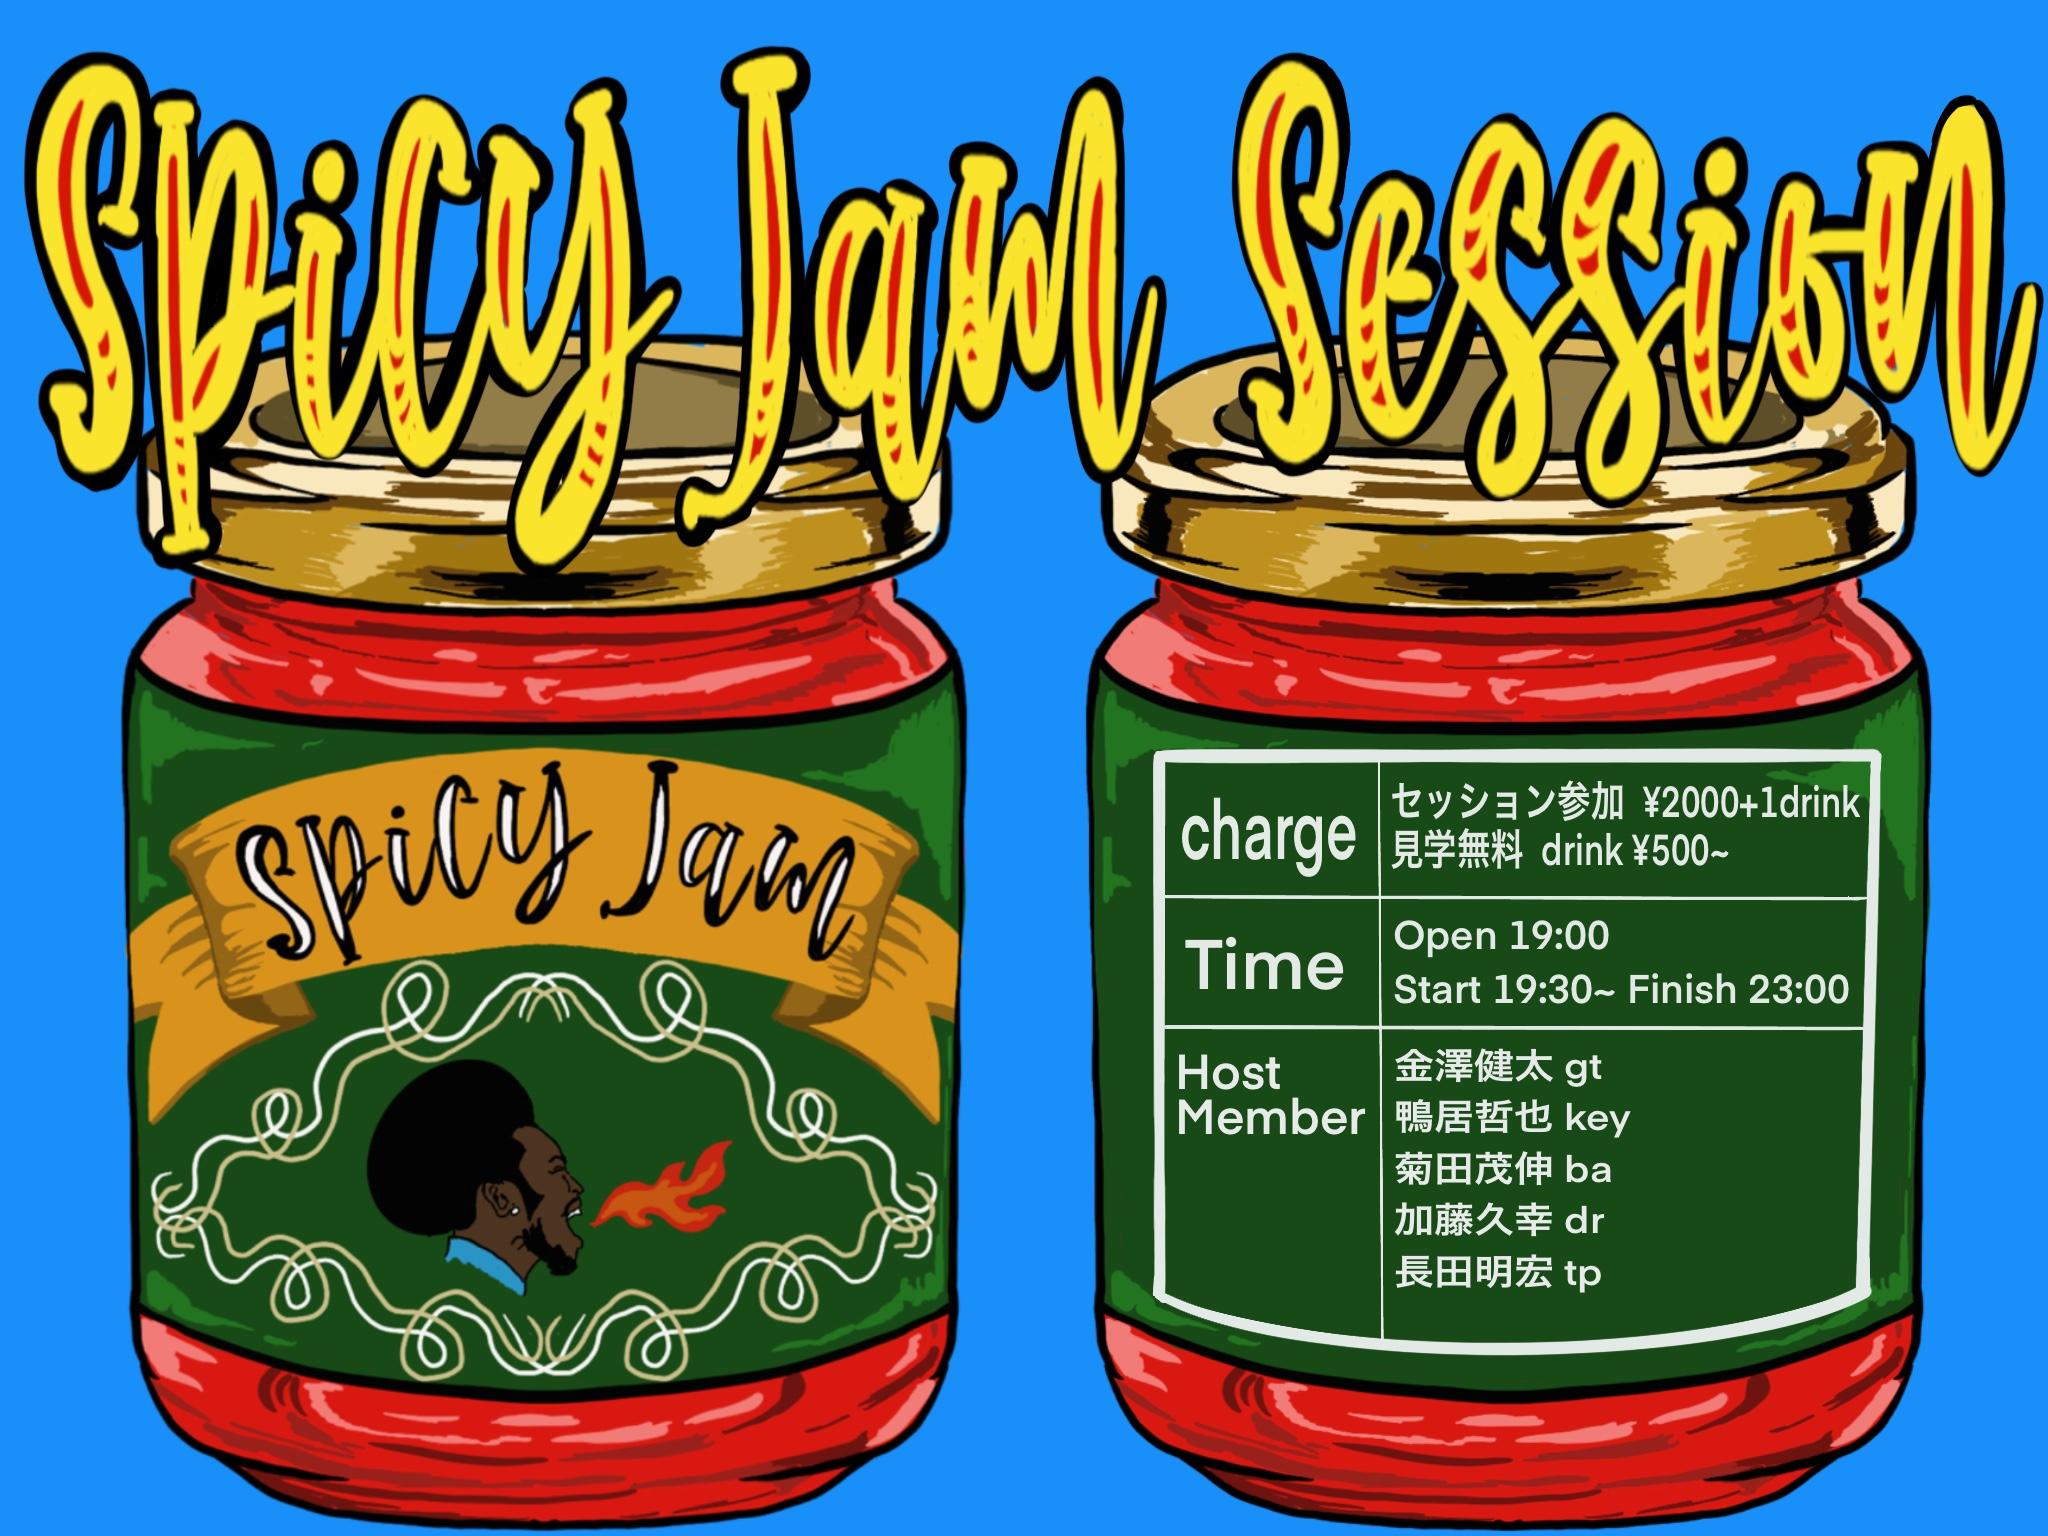 Spicy Jam